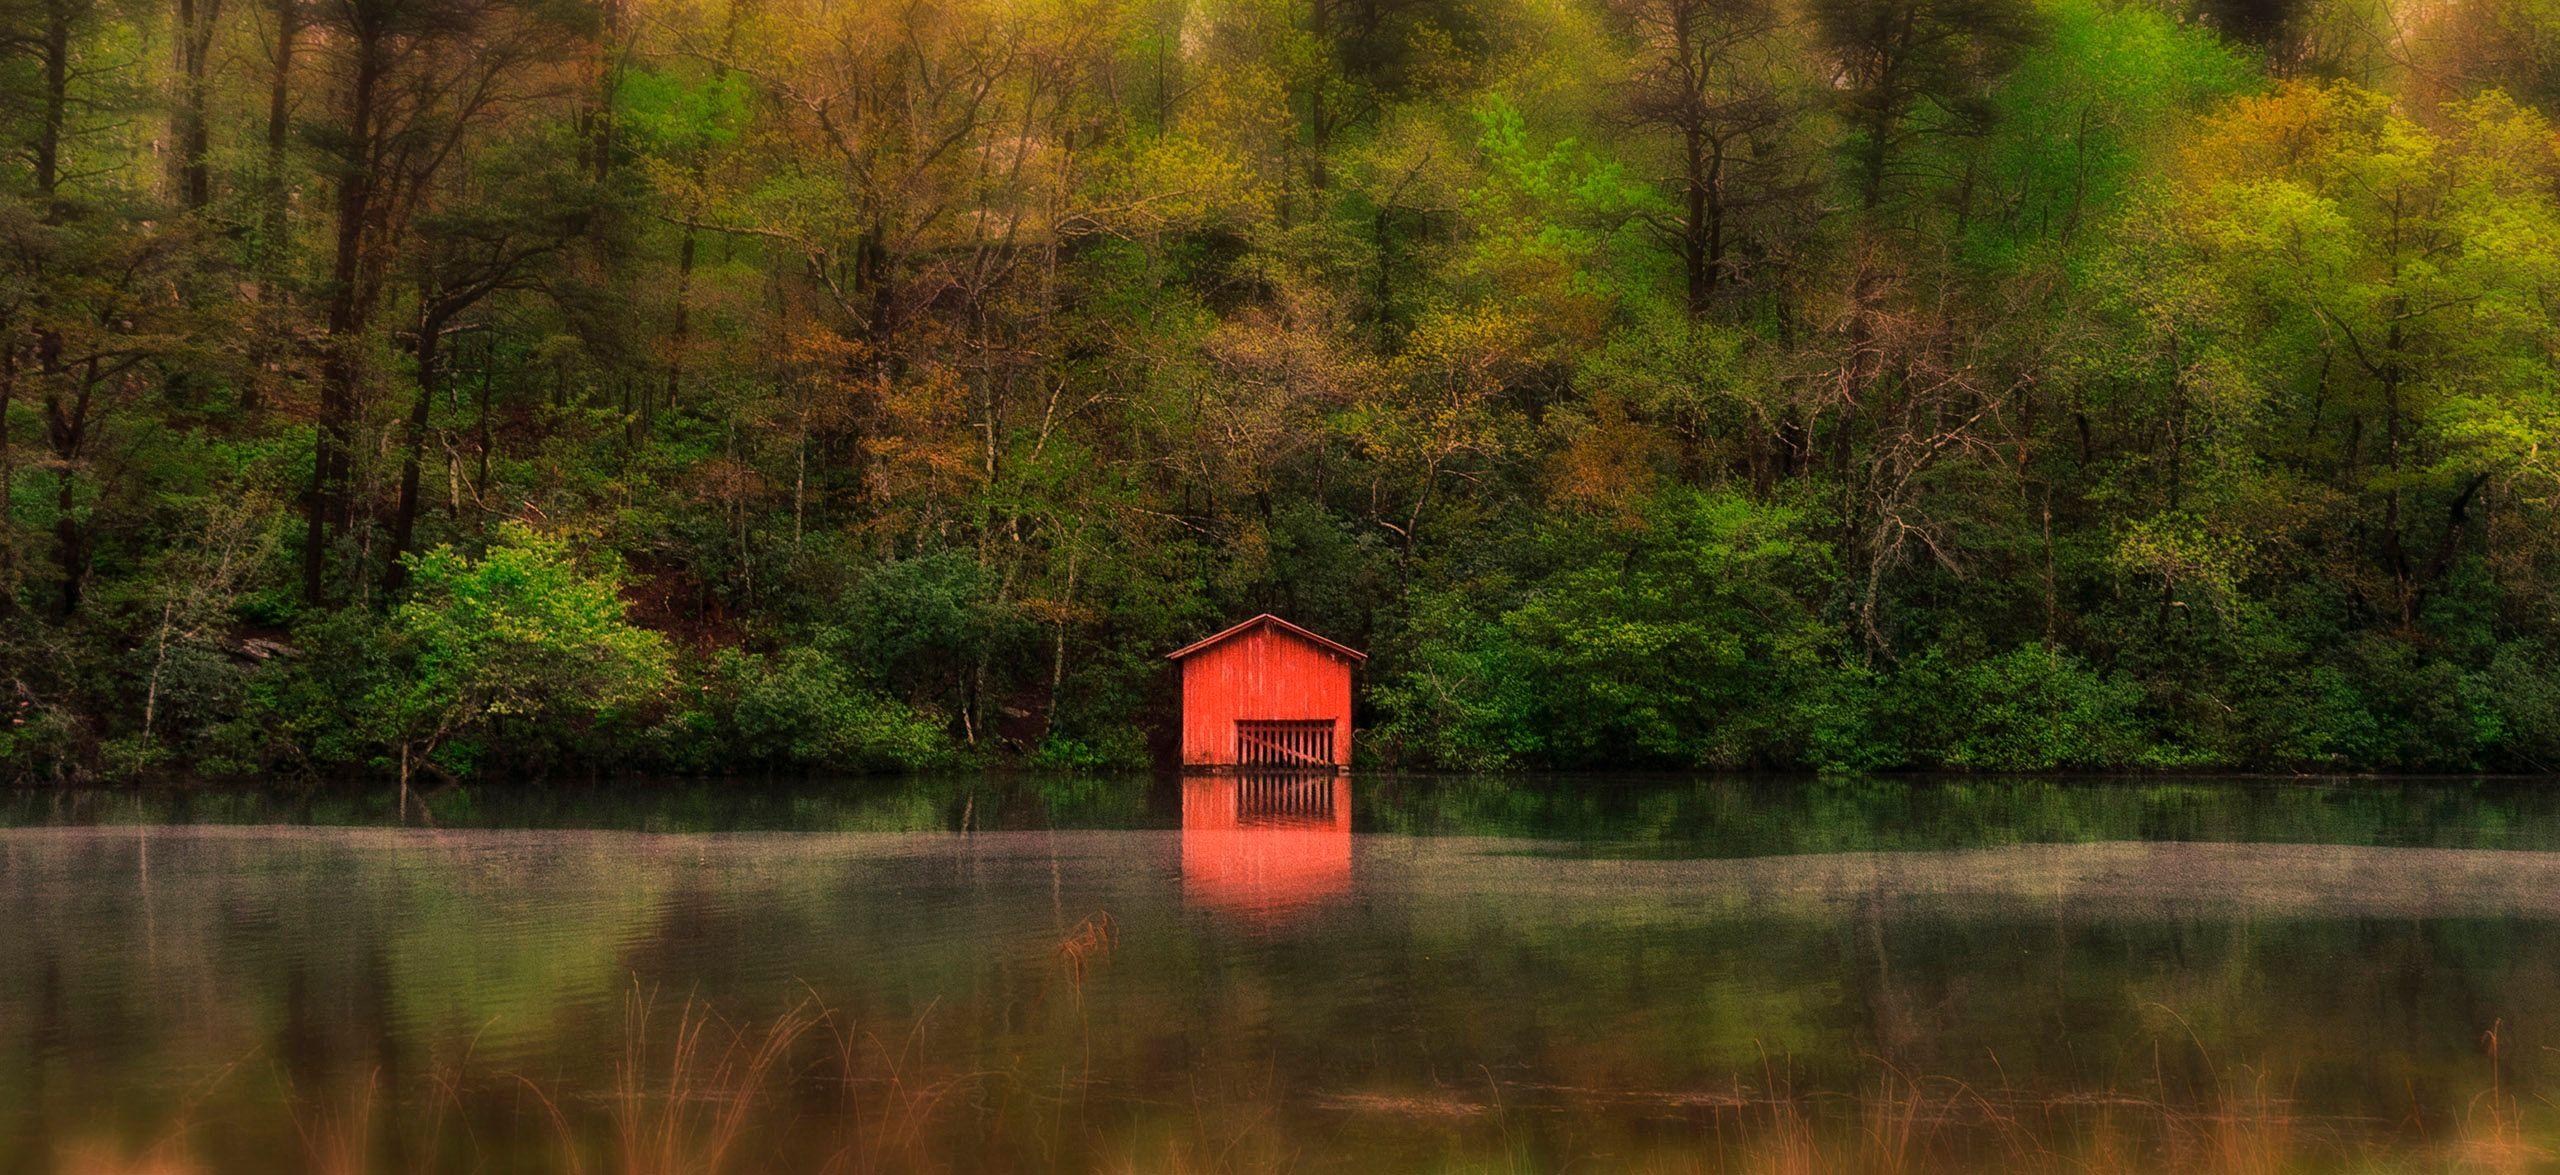 Red Boat House Alabama crop 1.jpg